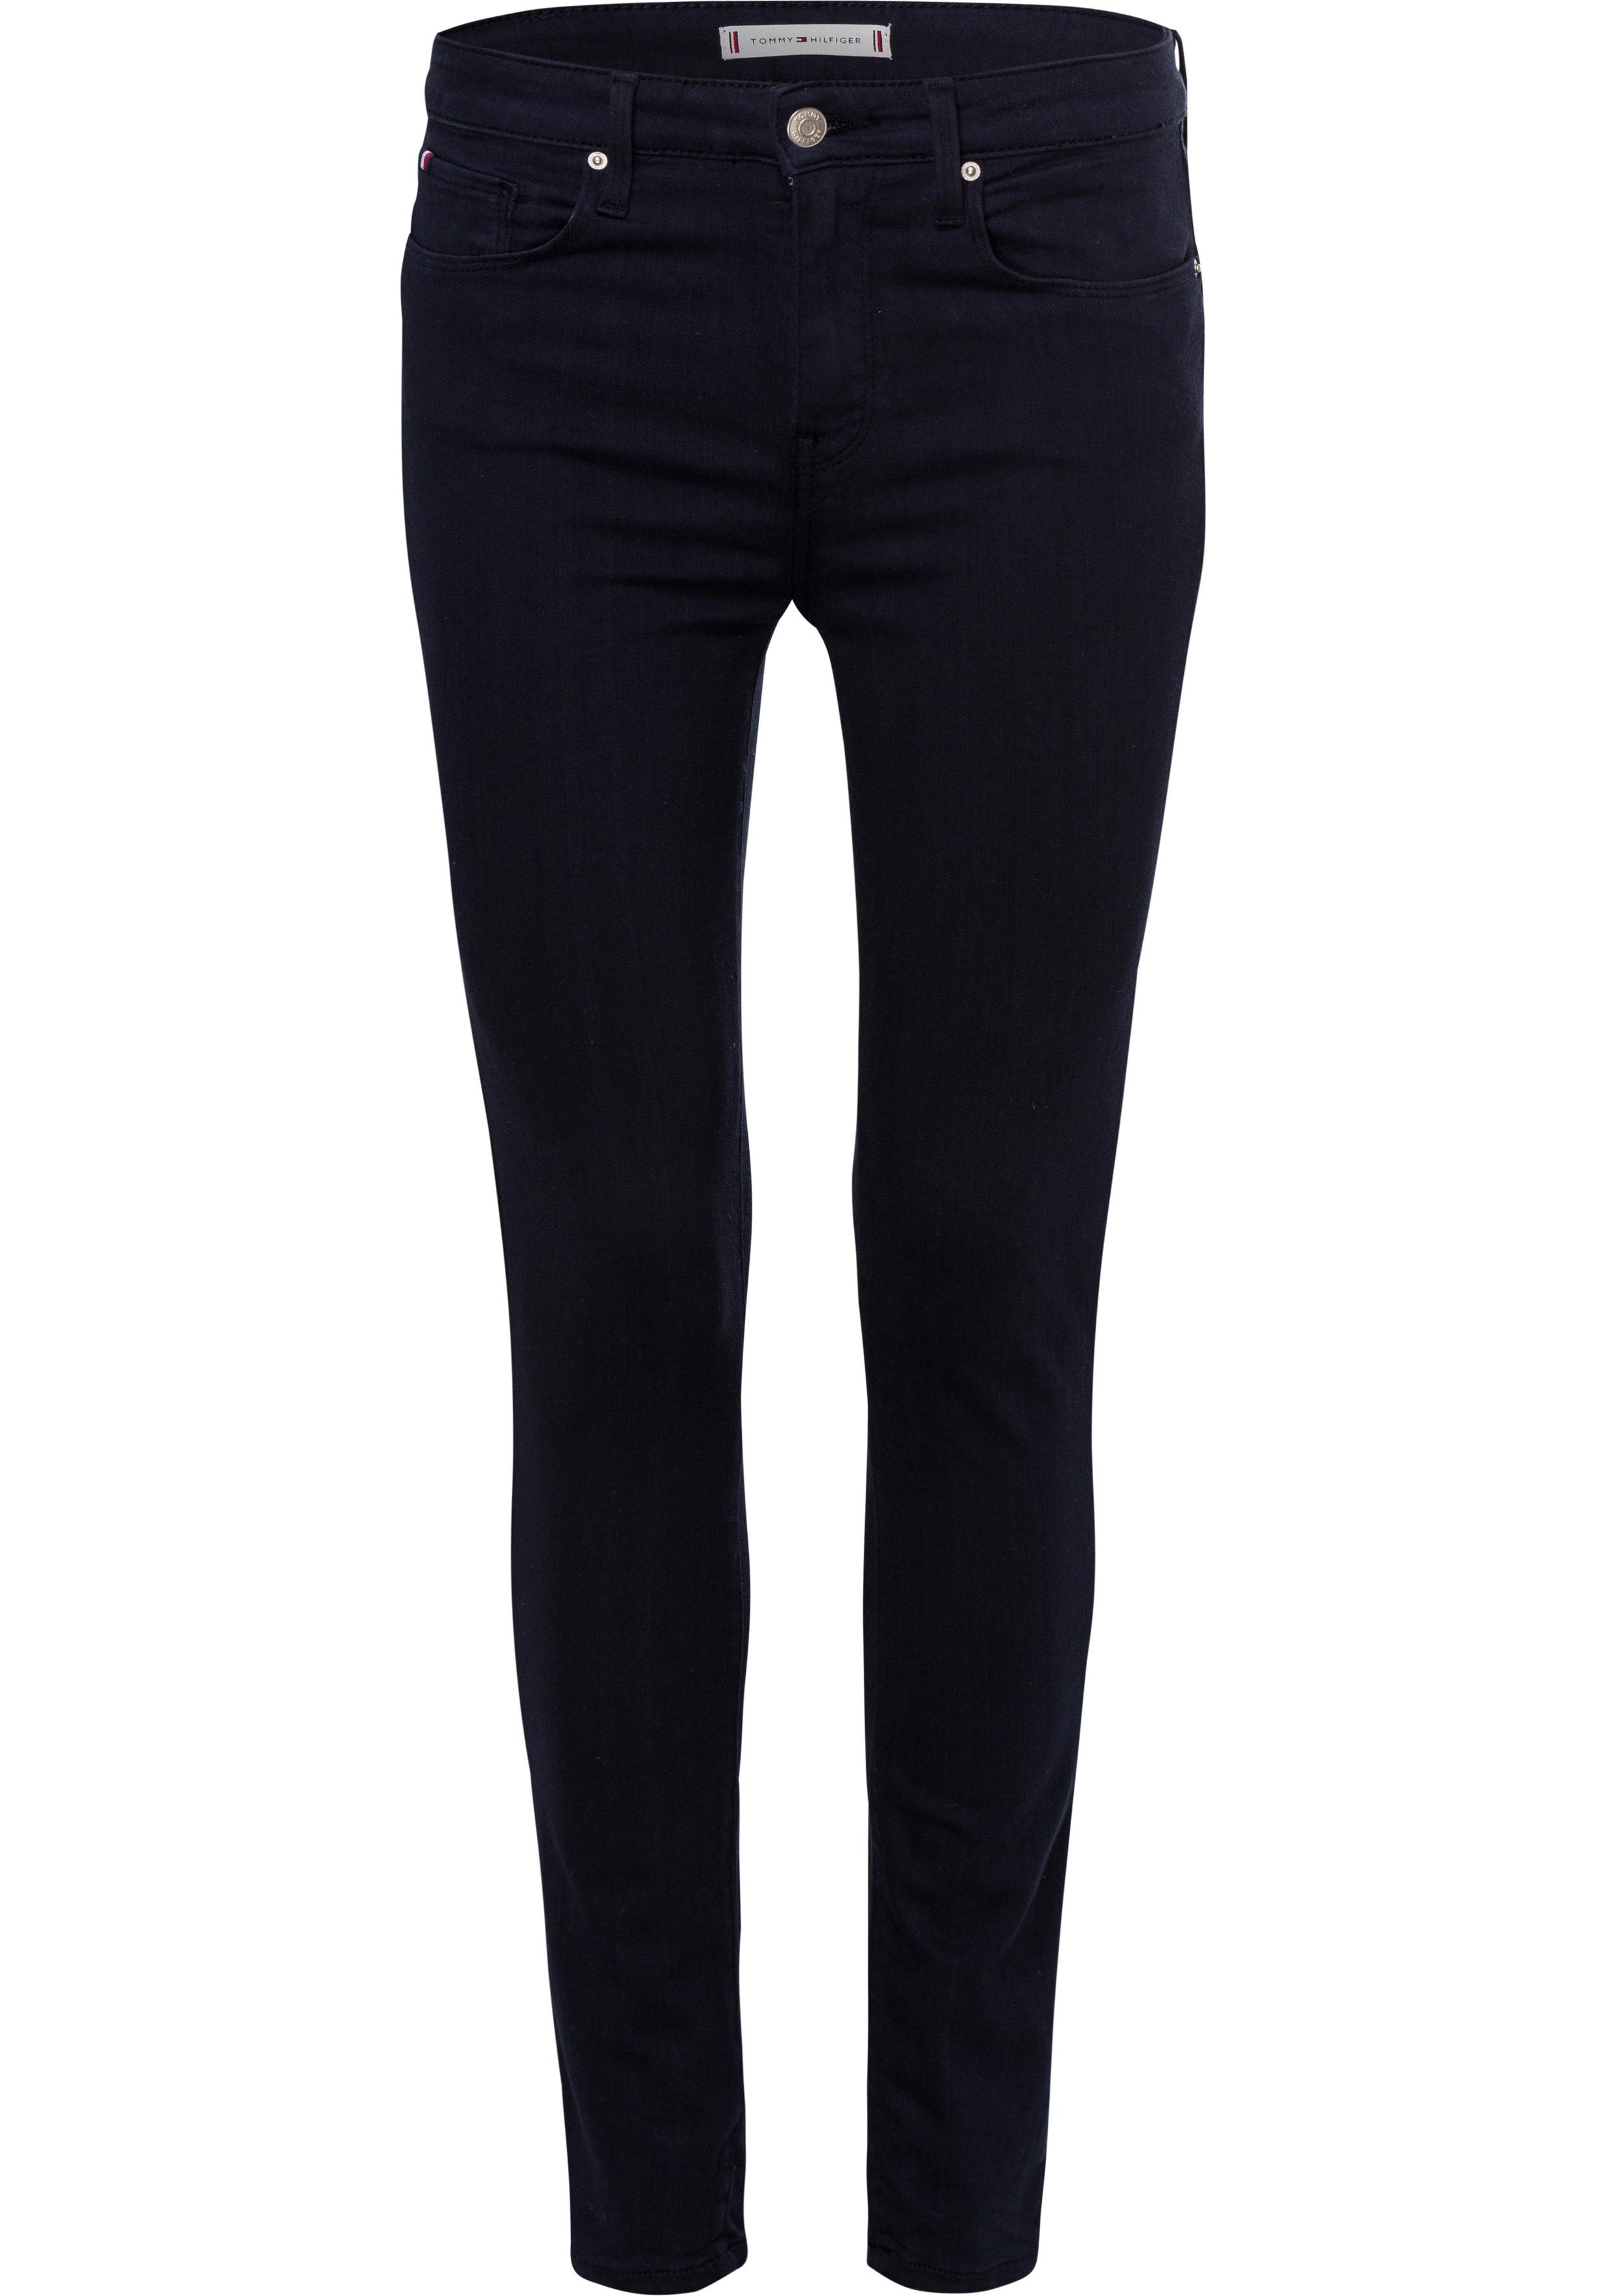 tommy hilfiger -  Skinny-fit-Jeans TH FLEX COMO SKINNY RW A CLR, in modischen Farben